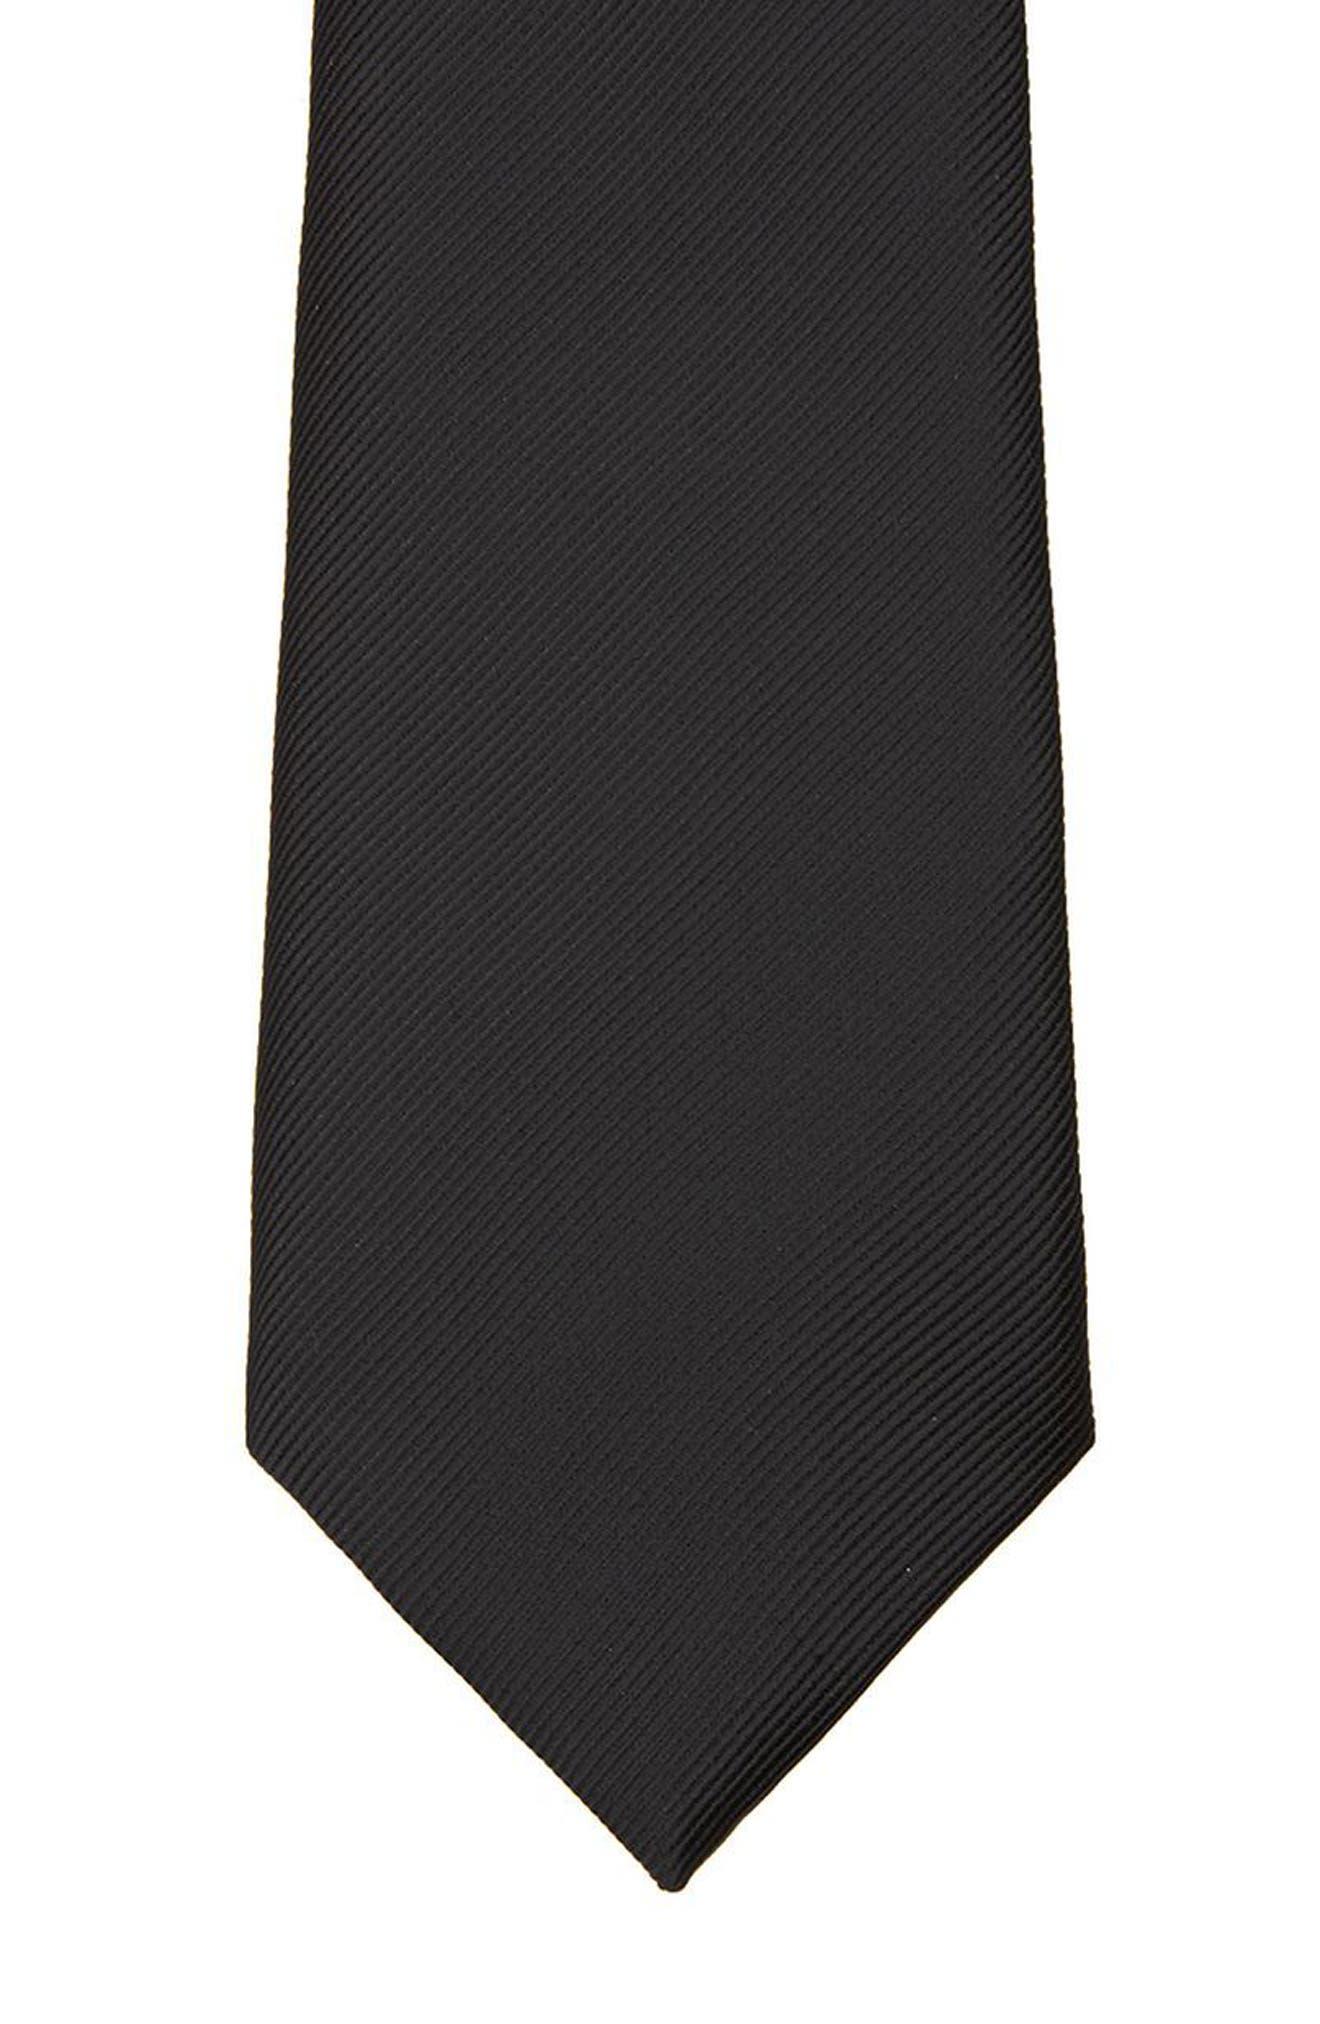 Black Woven Tie,                             Alternate thumbnail 2, color,                             Black